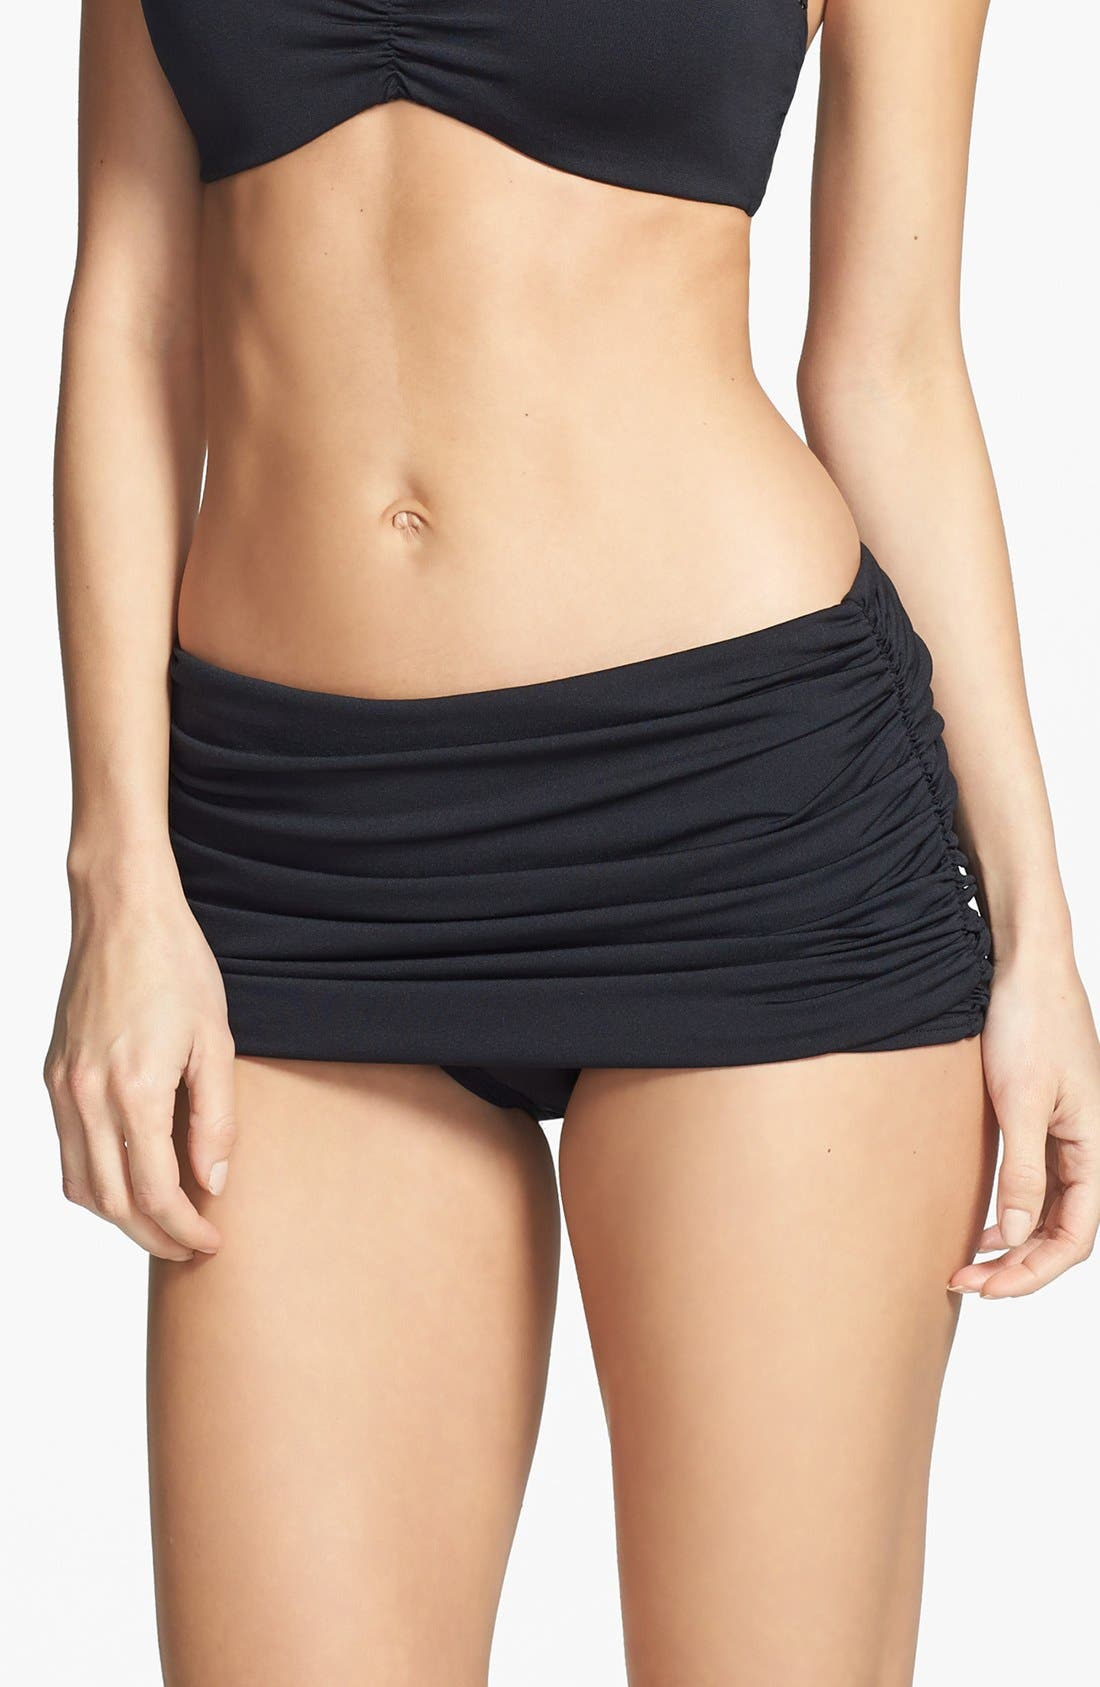 Carmen Marc Valvo 'Cape Town Beach' Shirred Skirted Bikini Bottoms,                             Main thumbnail 1, color,                             Luxe Black